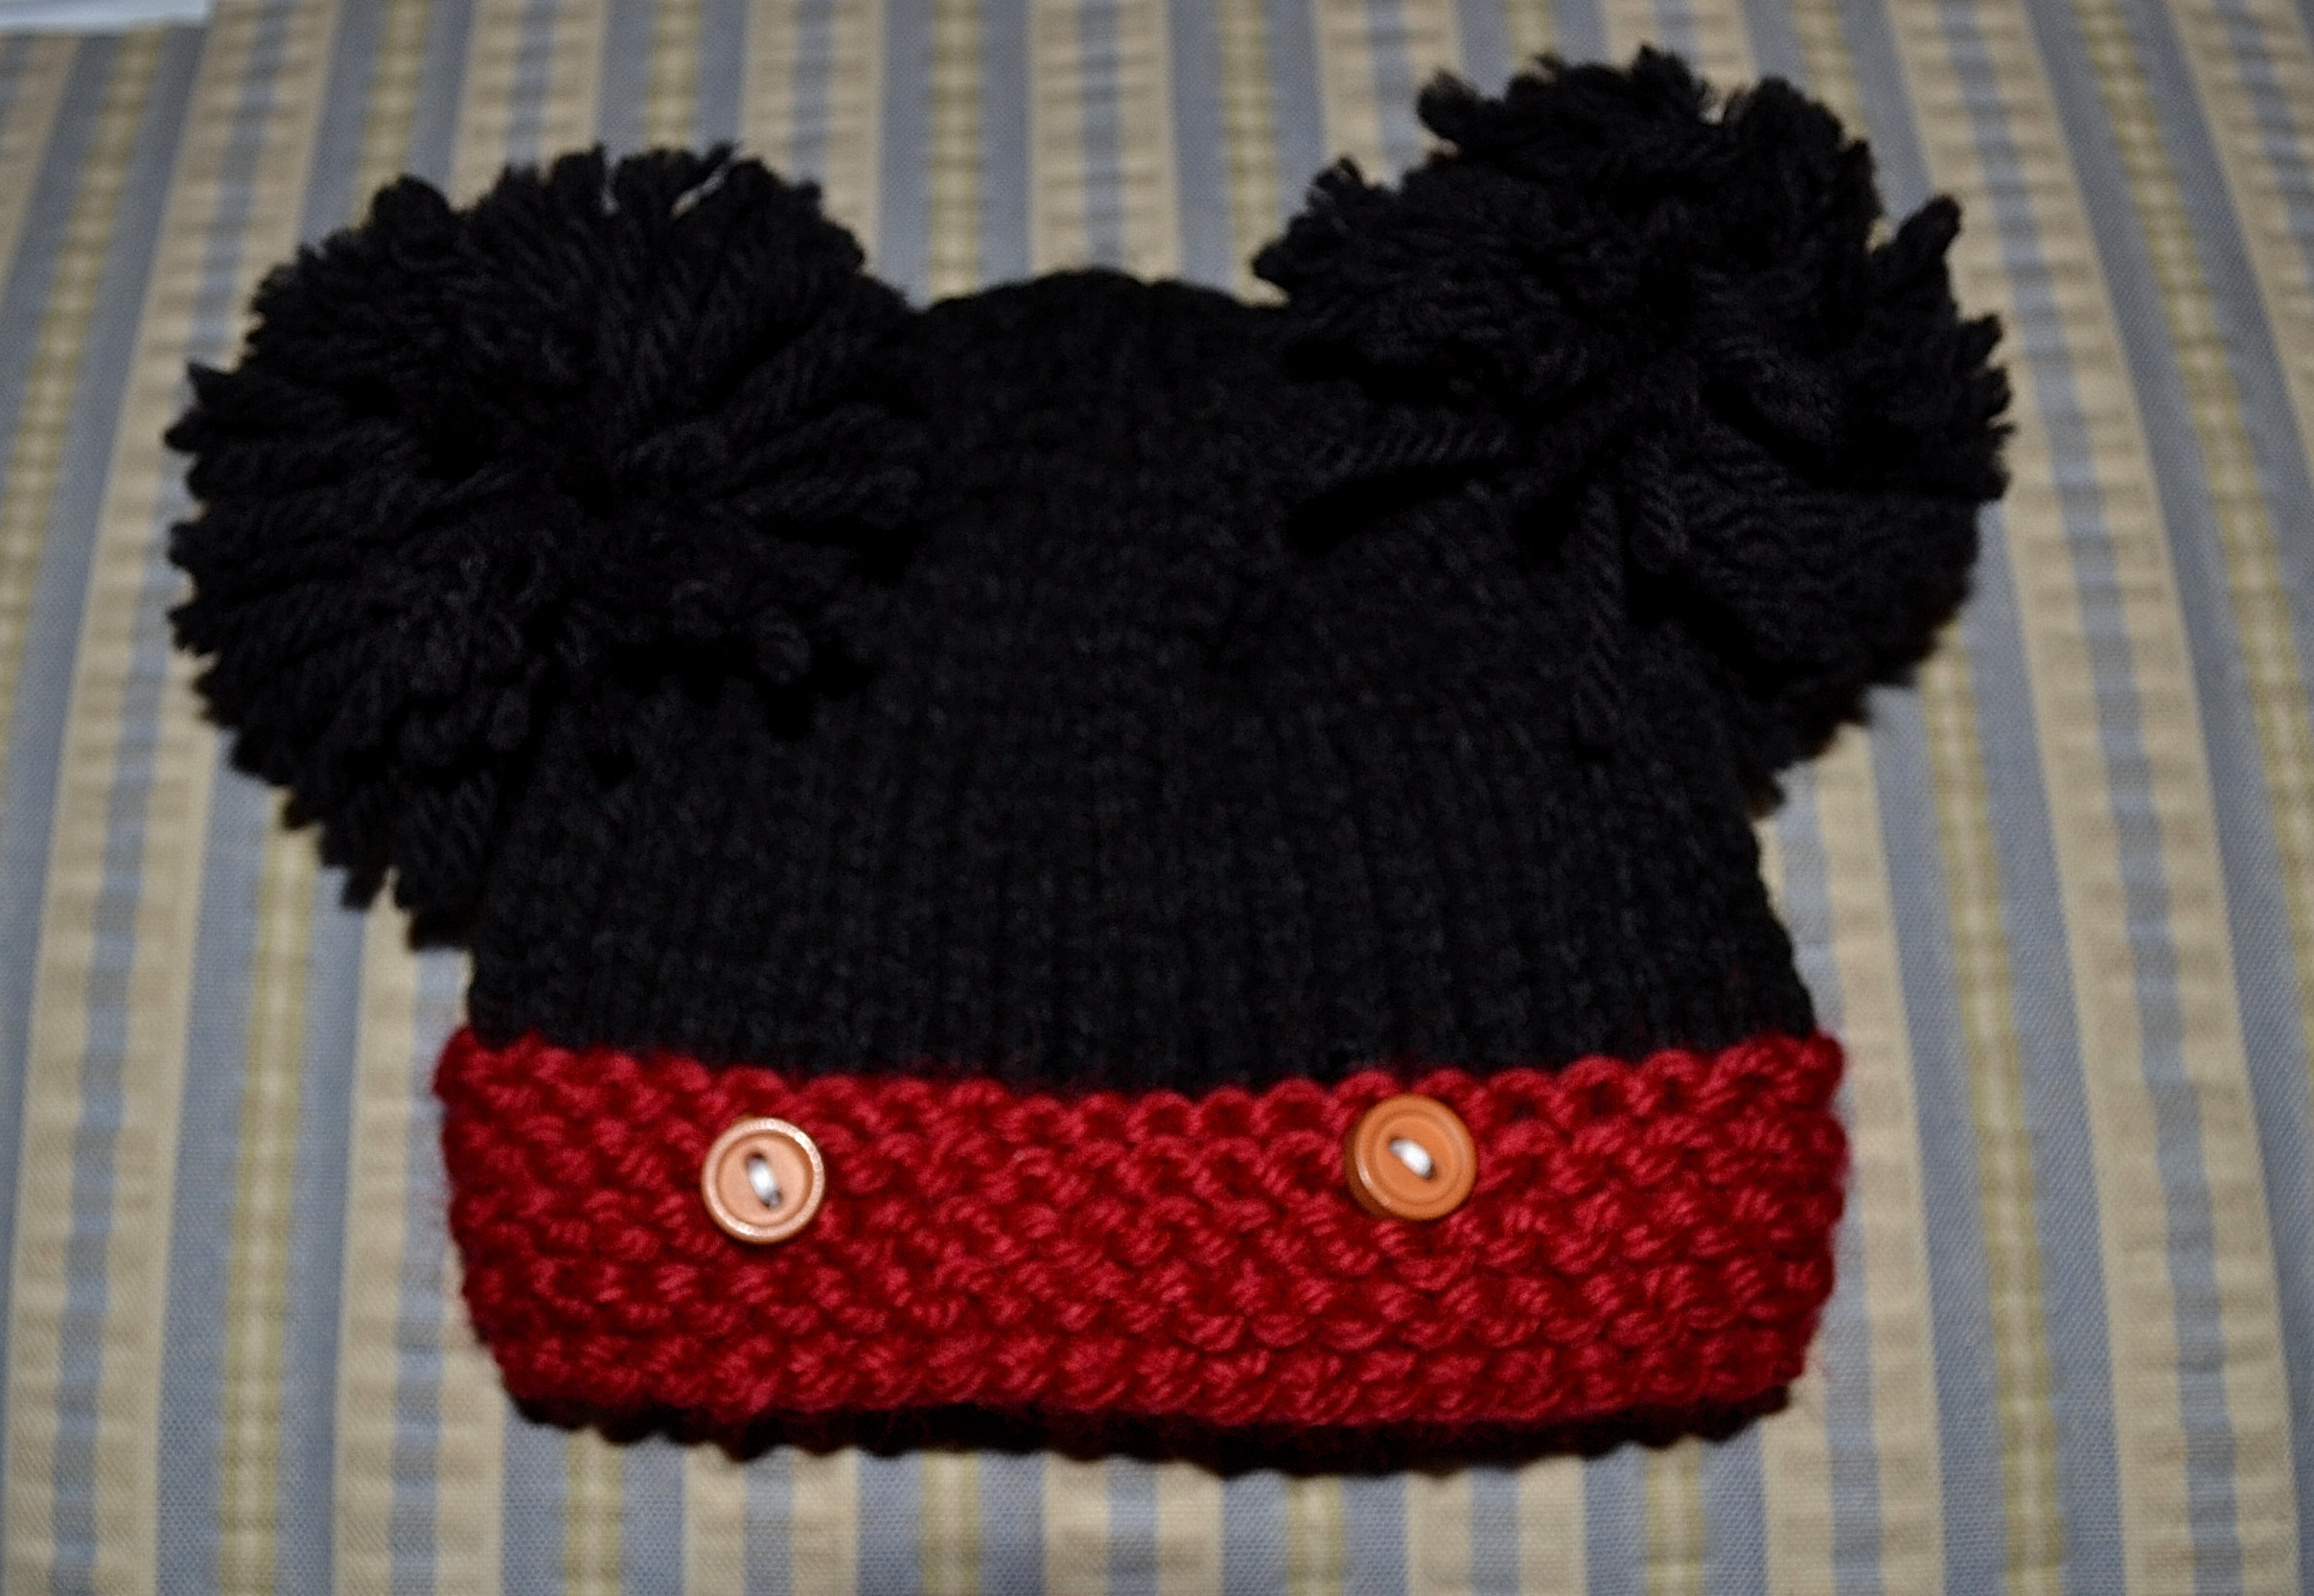 Mickey Mouse Crochet Pattern Free Amazing Inspiration Design